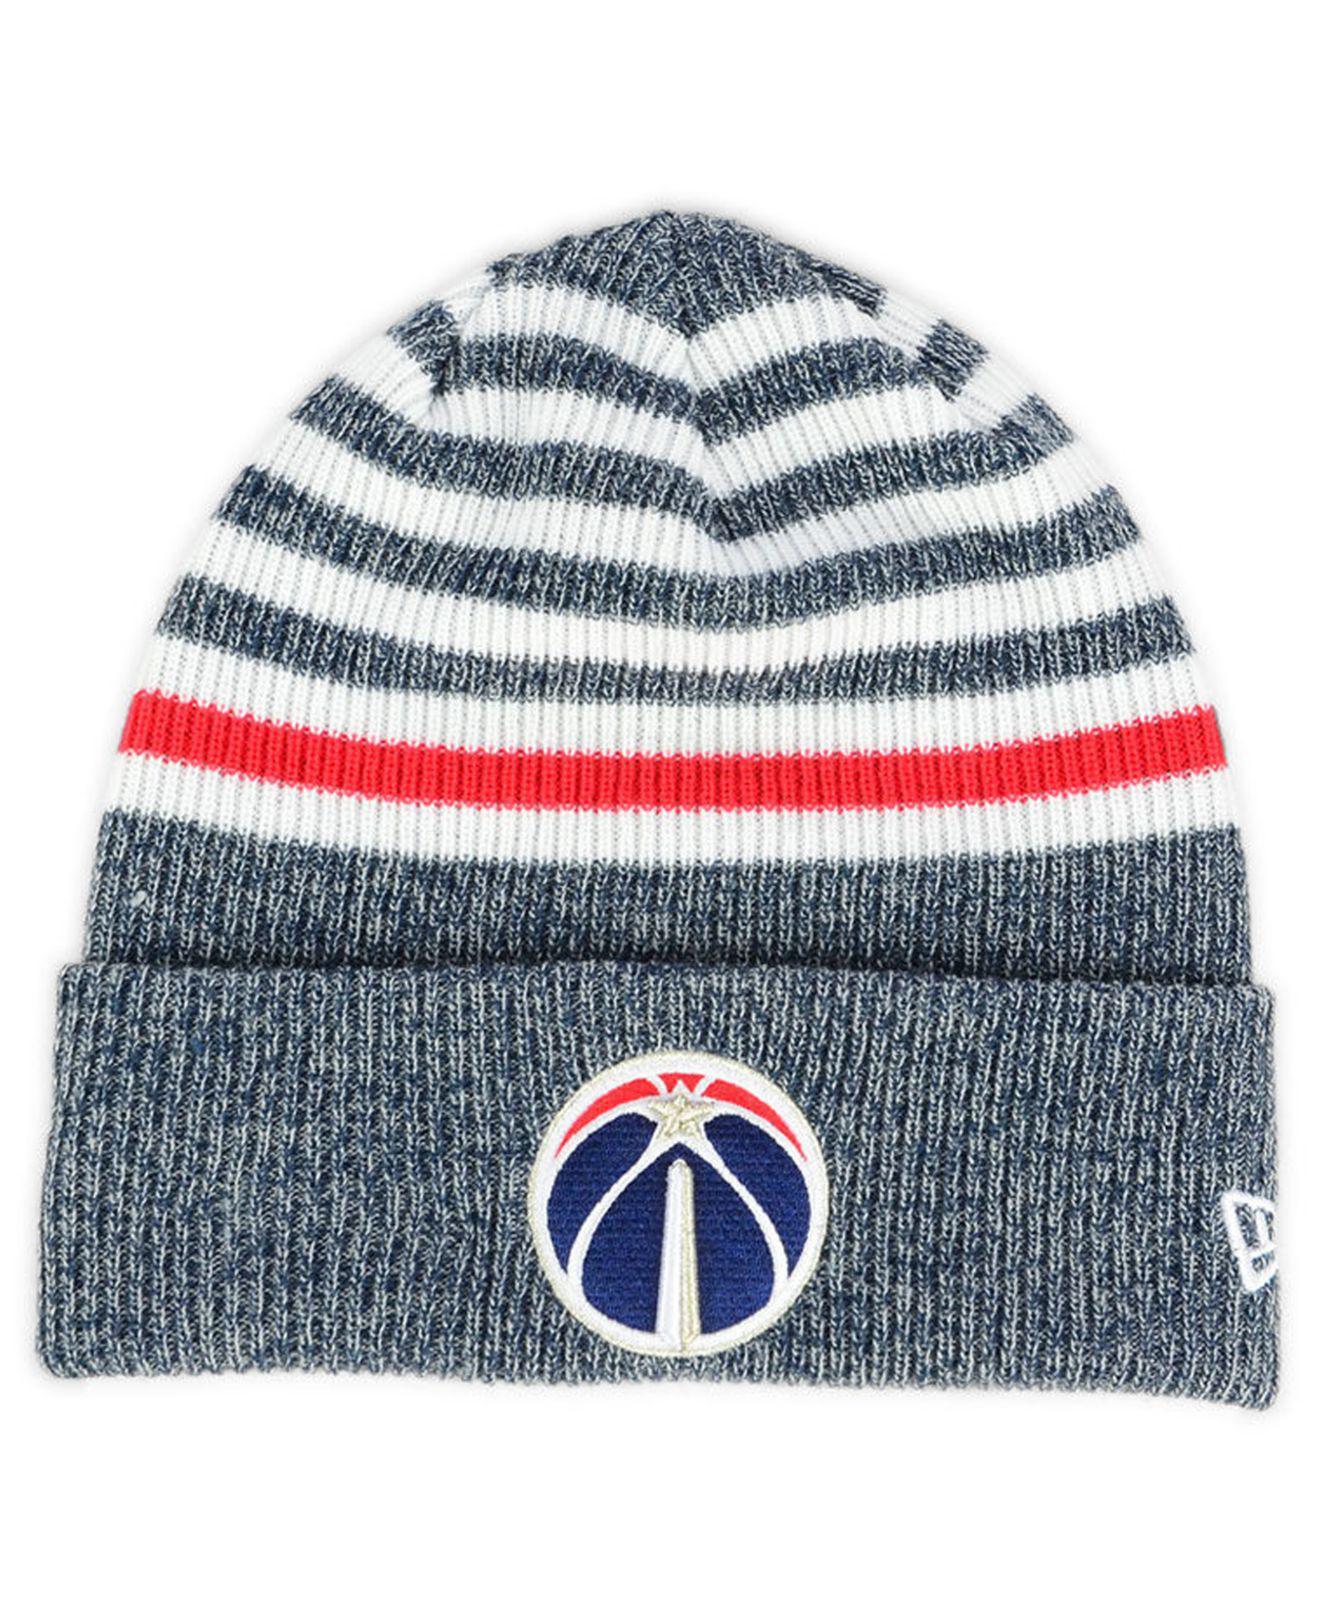 Lyst - Ktz Washington Wizards Striped Cuff Knit Hat in Blue for Men 66df0e09e20